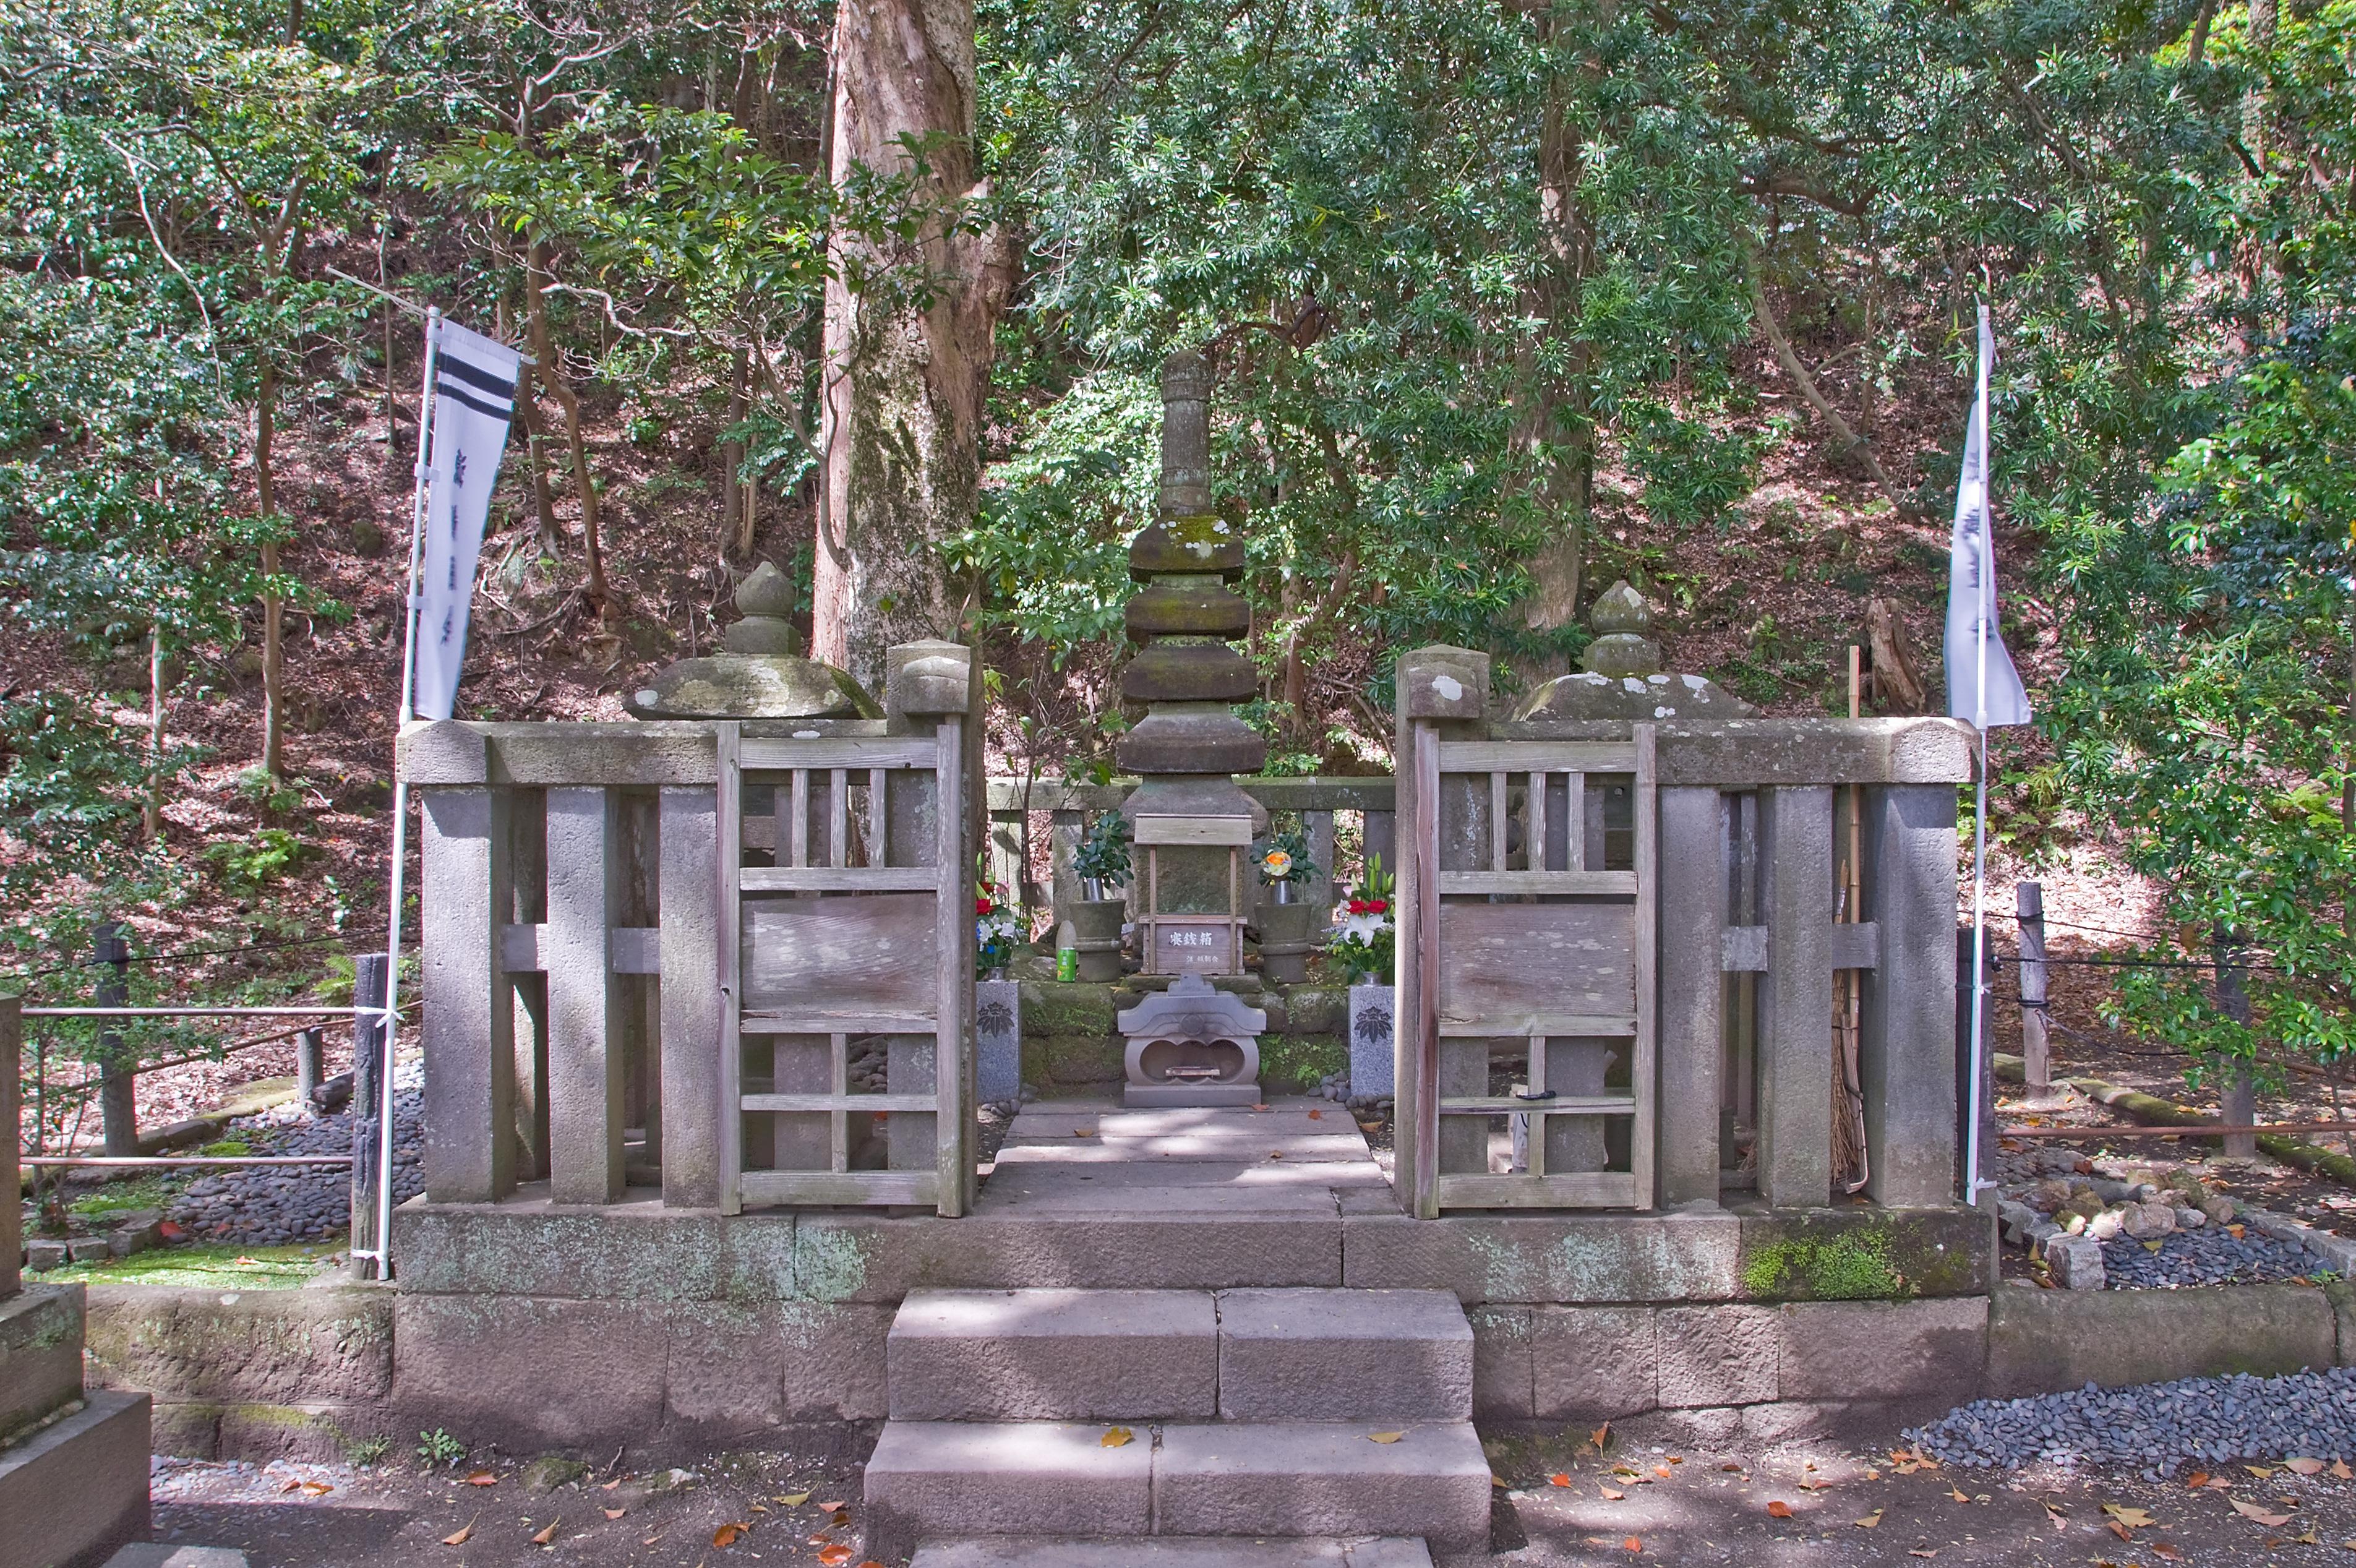 japans shogunate history under minamoto yoritomo History of a secret empire: the samurai, the the minamoto clan under minamoto no yoritomo emerged victorious shogunate - japanese history.